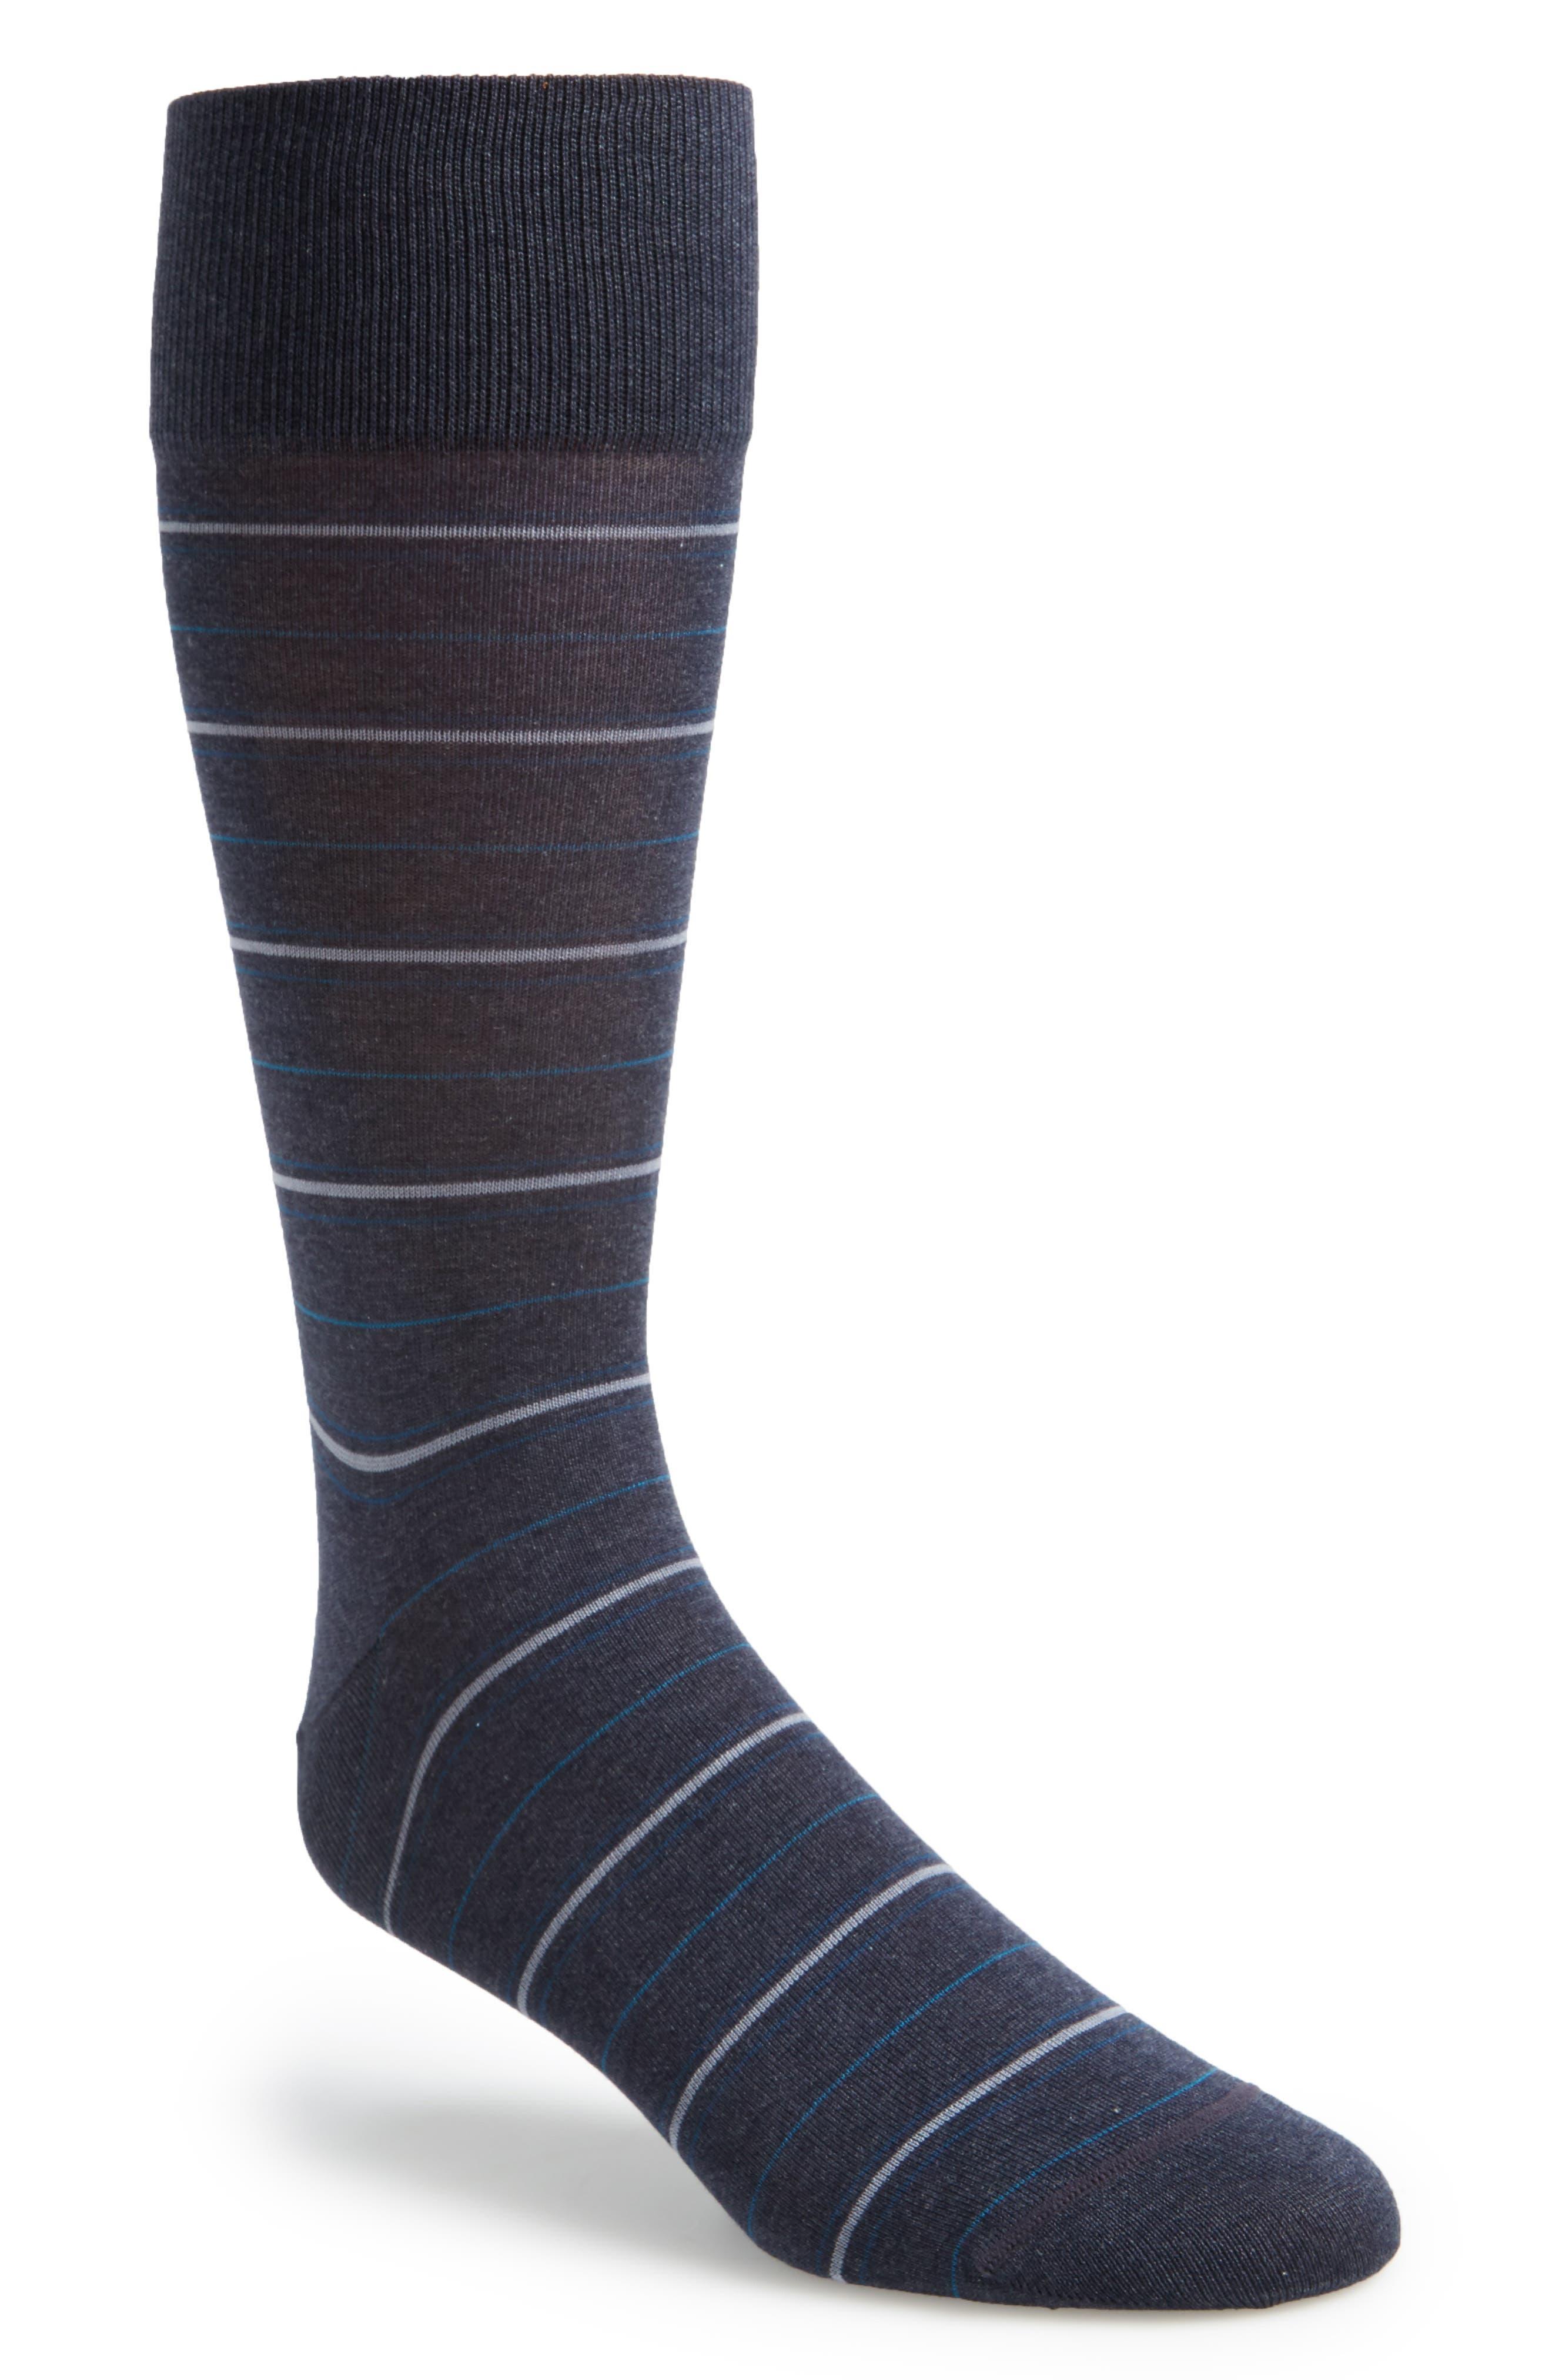 Interlines Socks,                         Main,                         color, Blue Denim